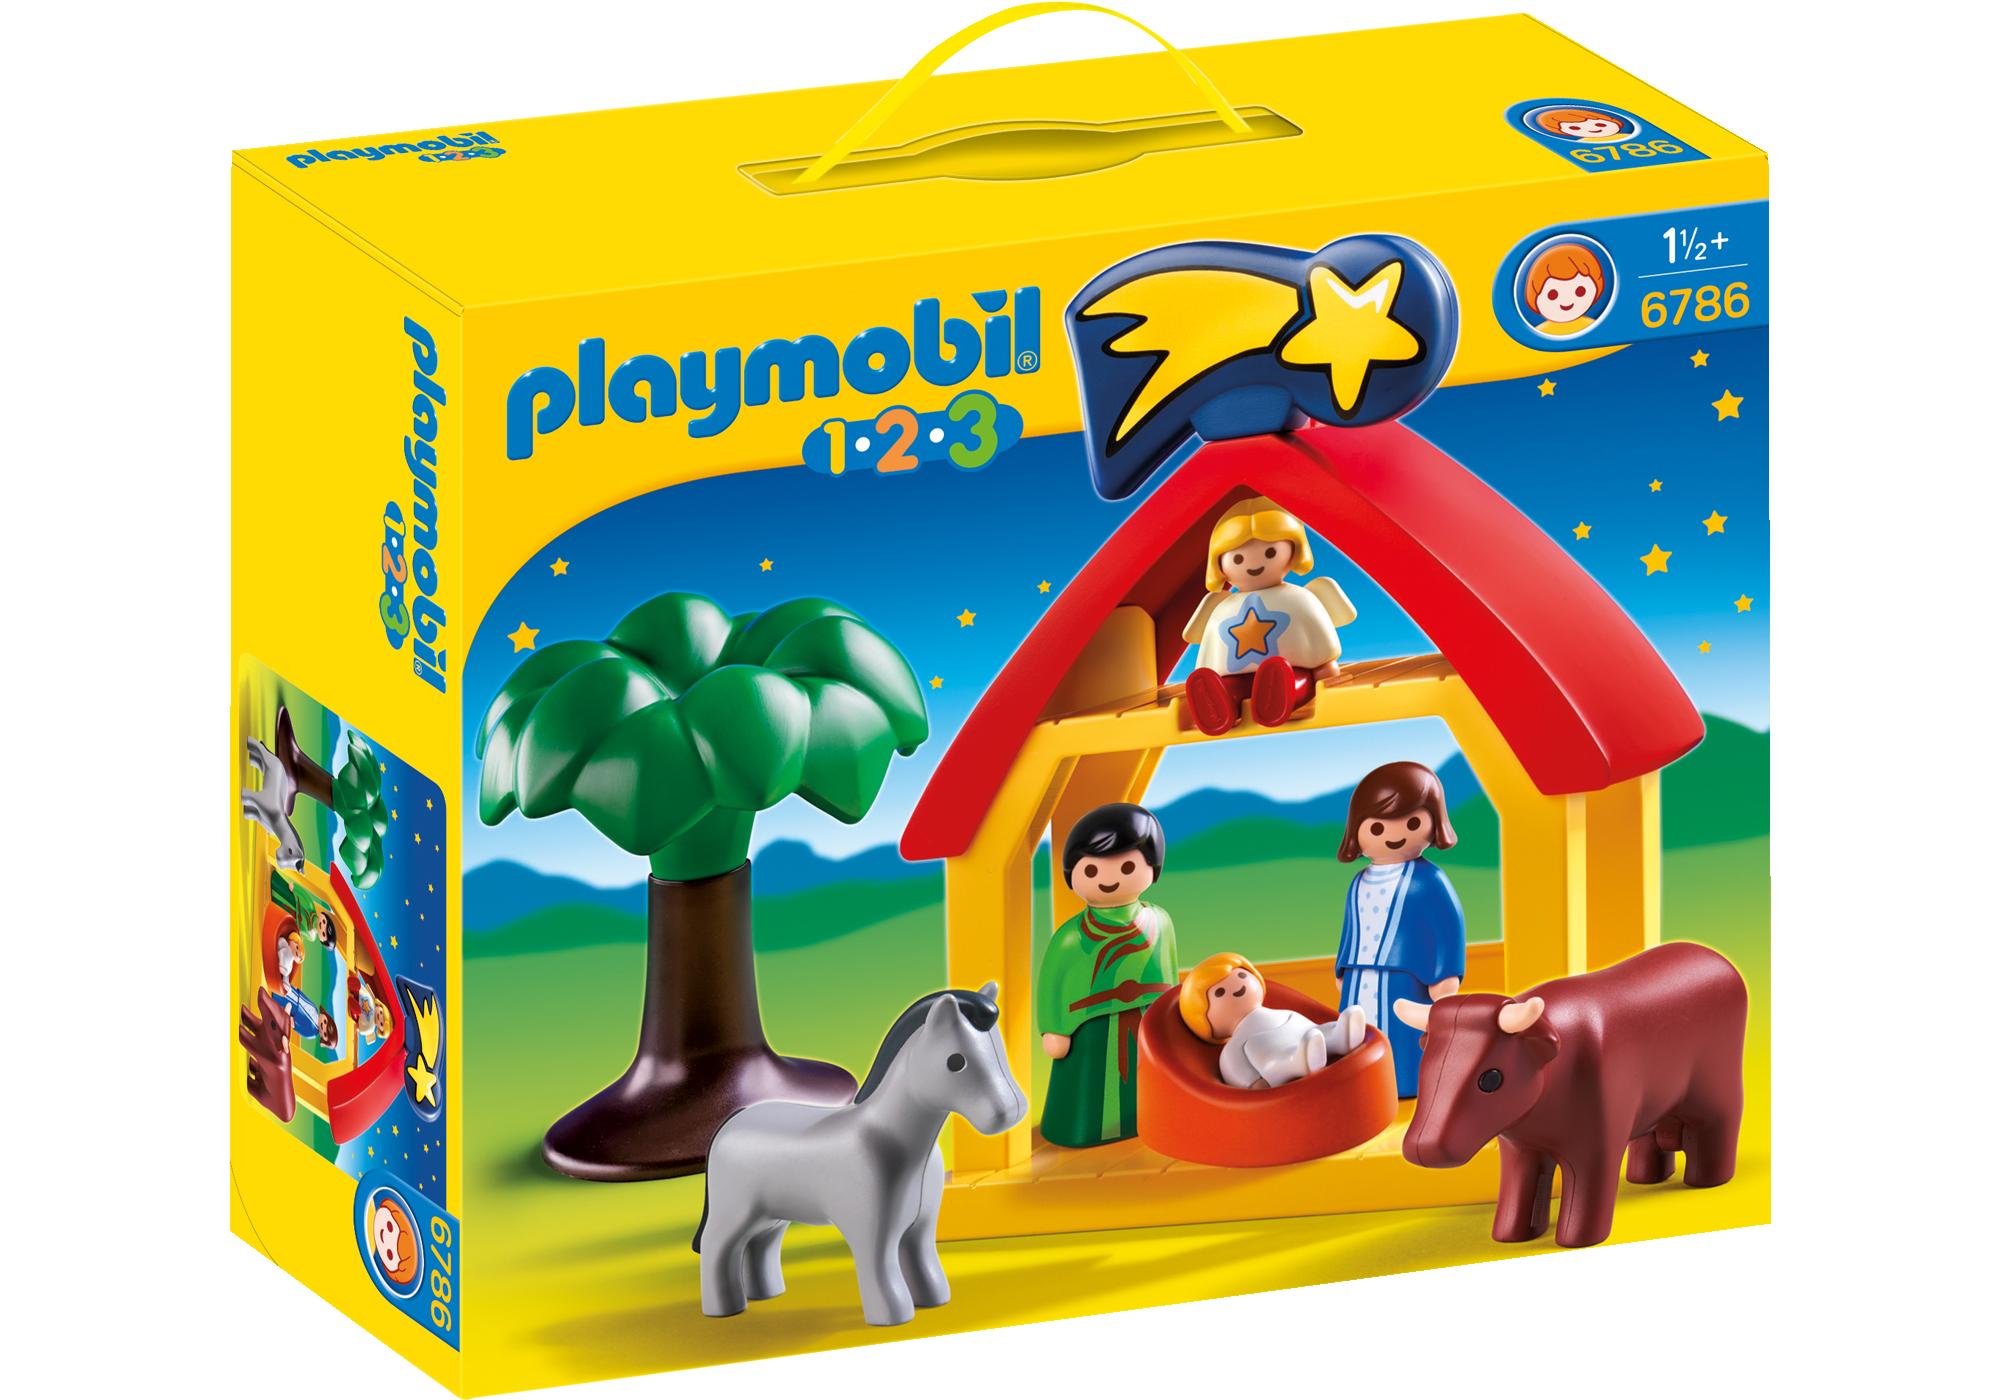 http://media.playmobil.com/i/playmobil/6786_product_box_front